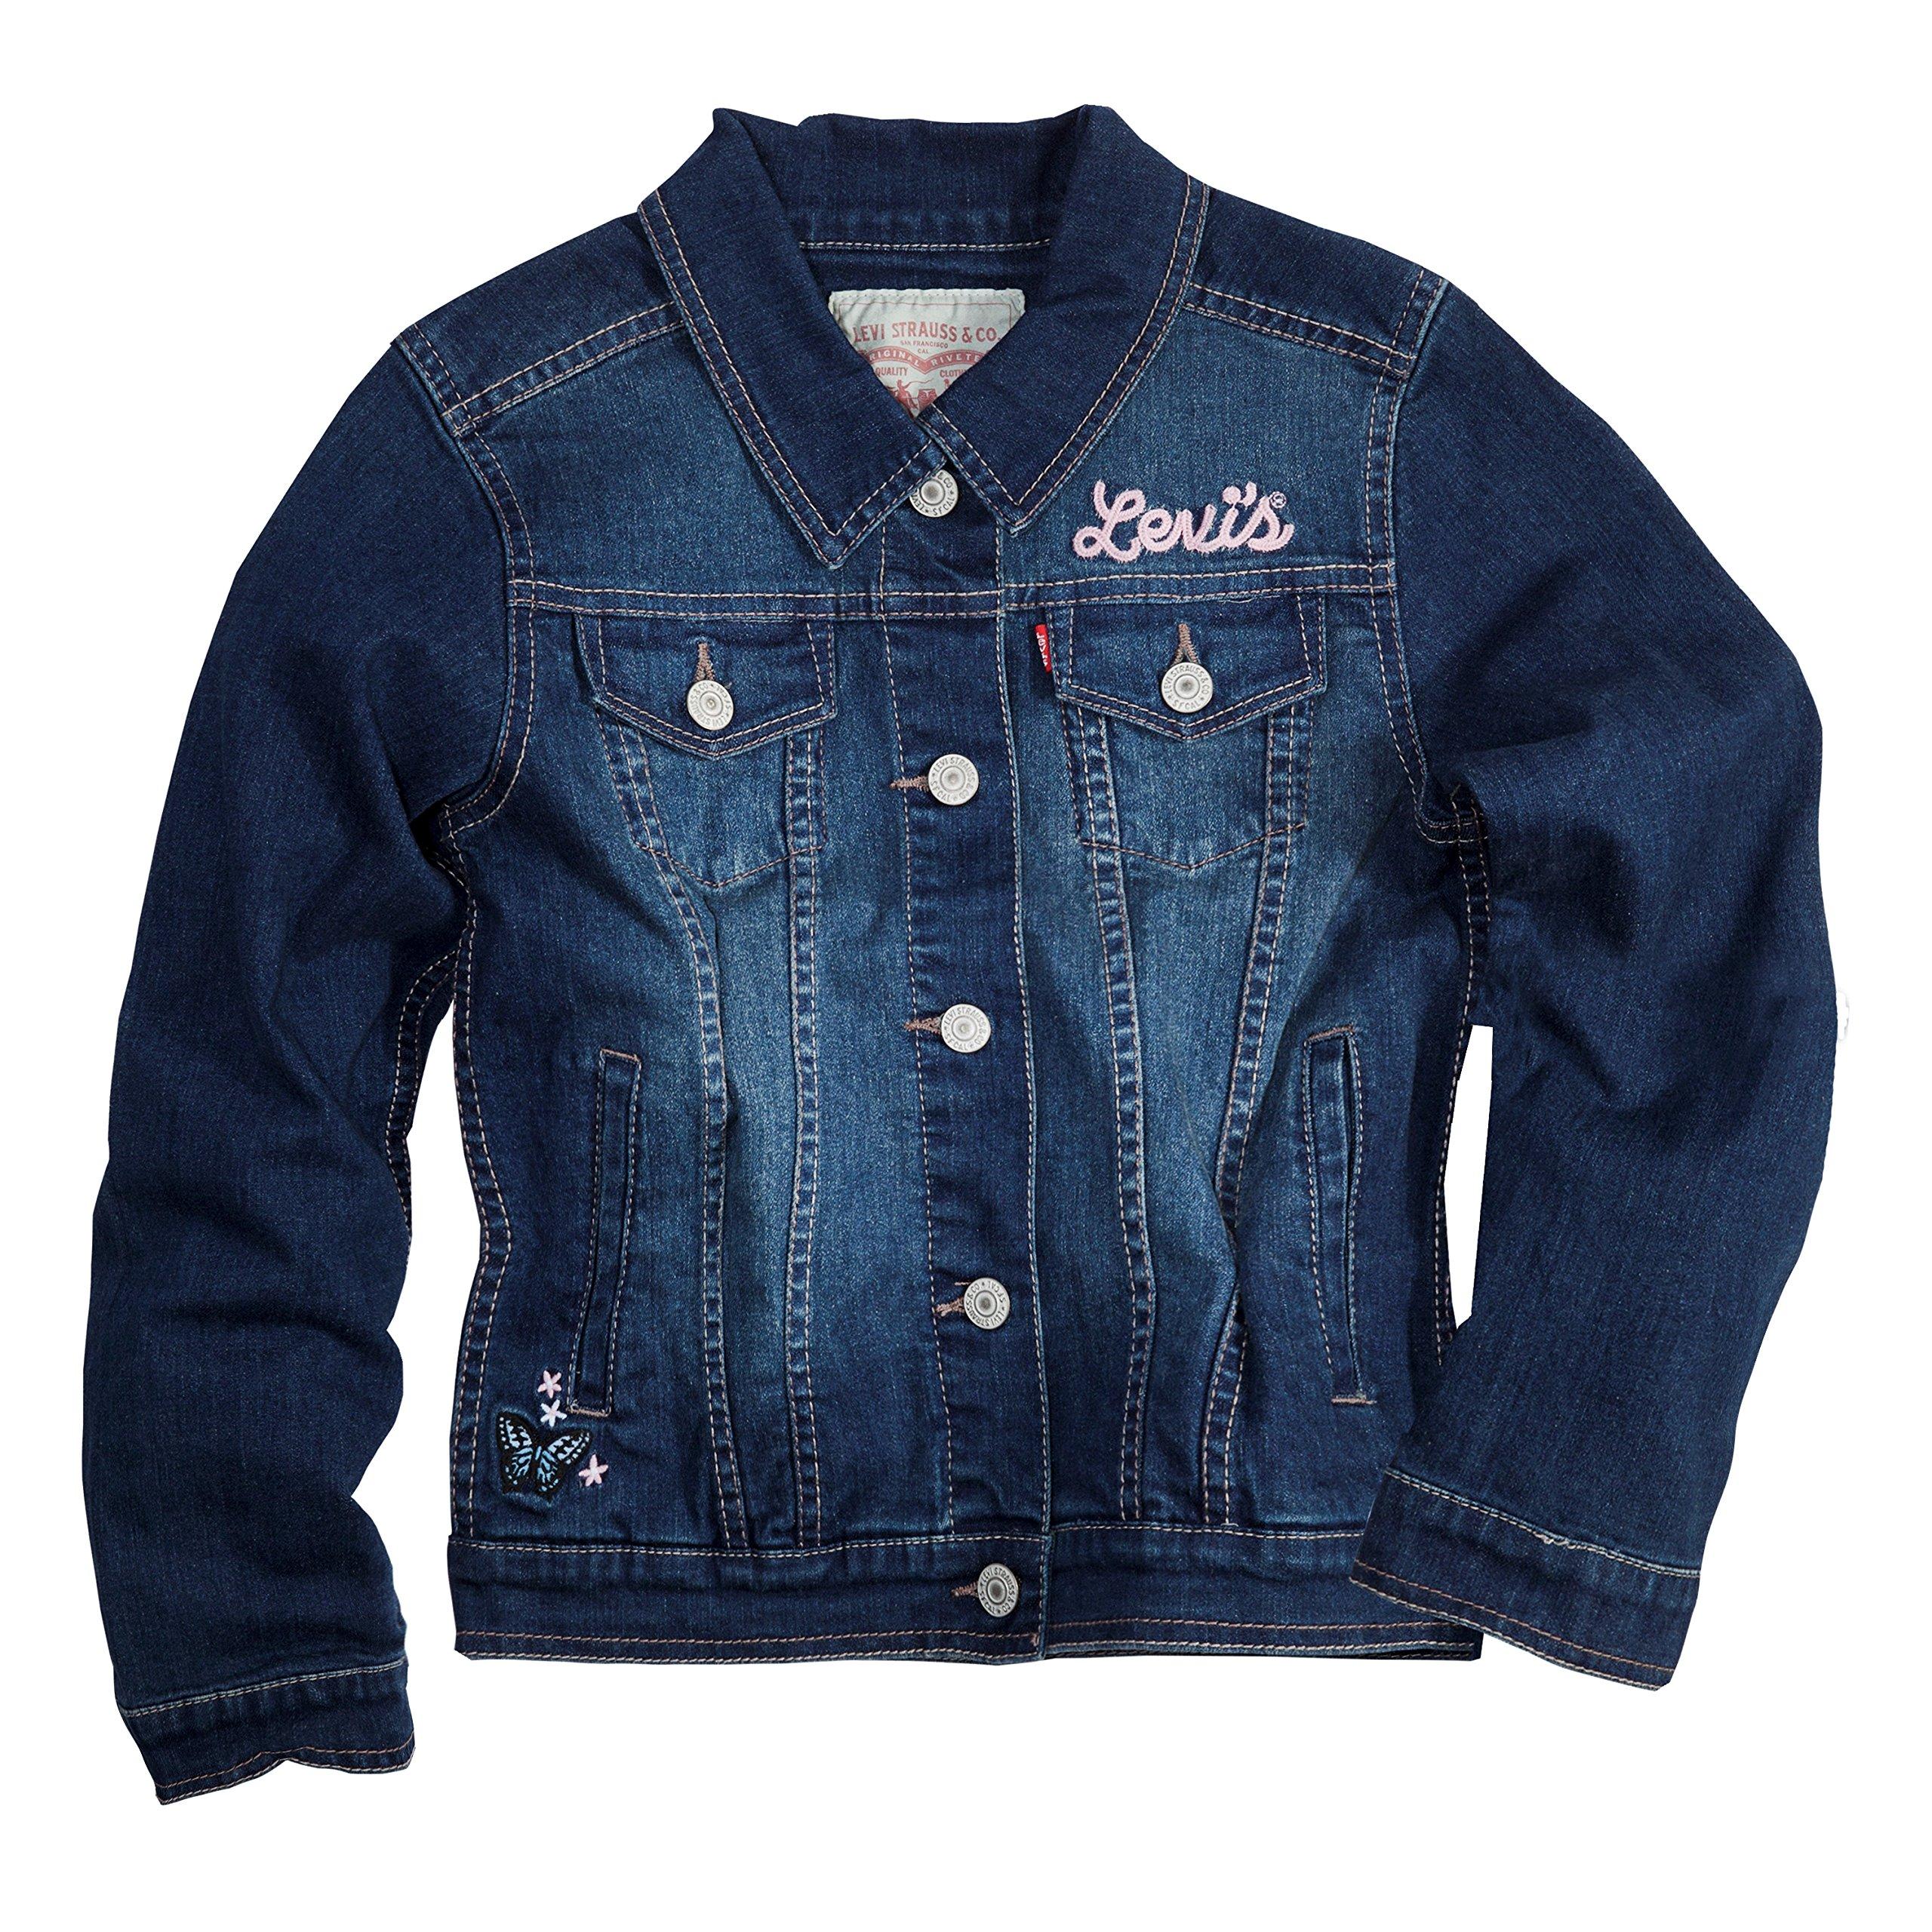 Levi's Toddler Girls Denim Trucker Jackets,Rockabilly,2T by Levi's